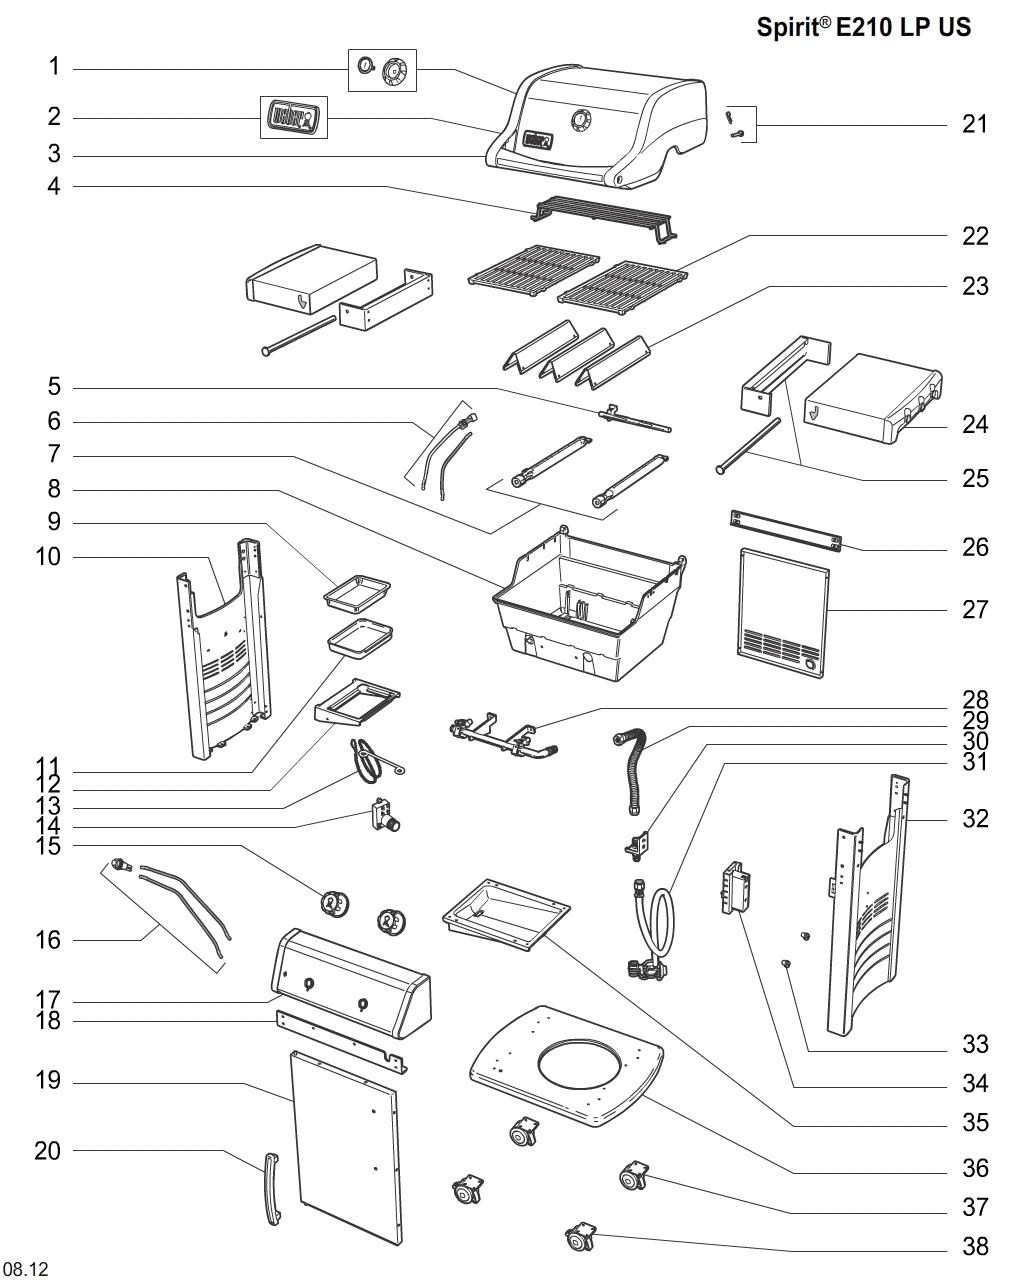 Schematic Image 46110001